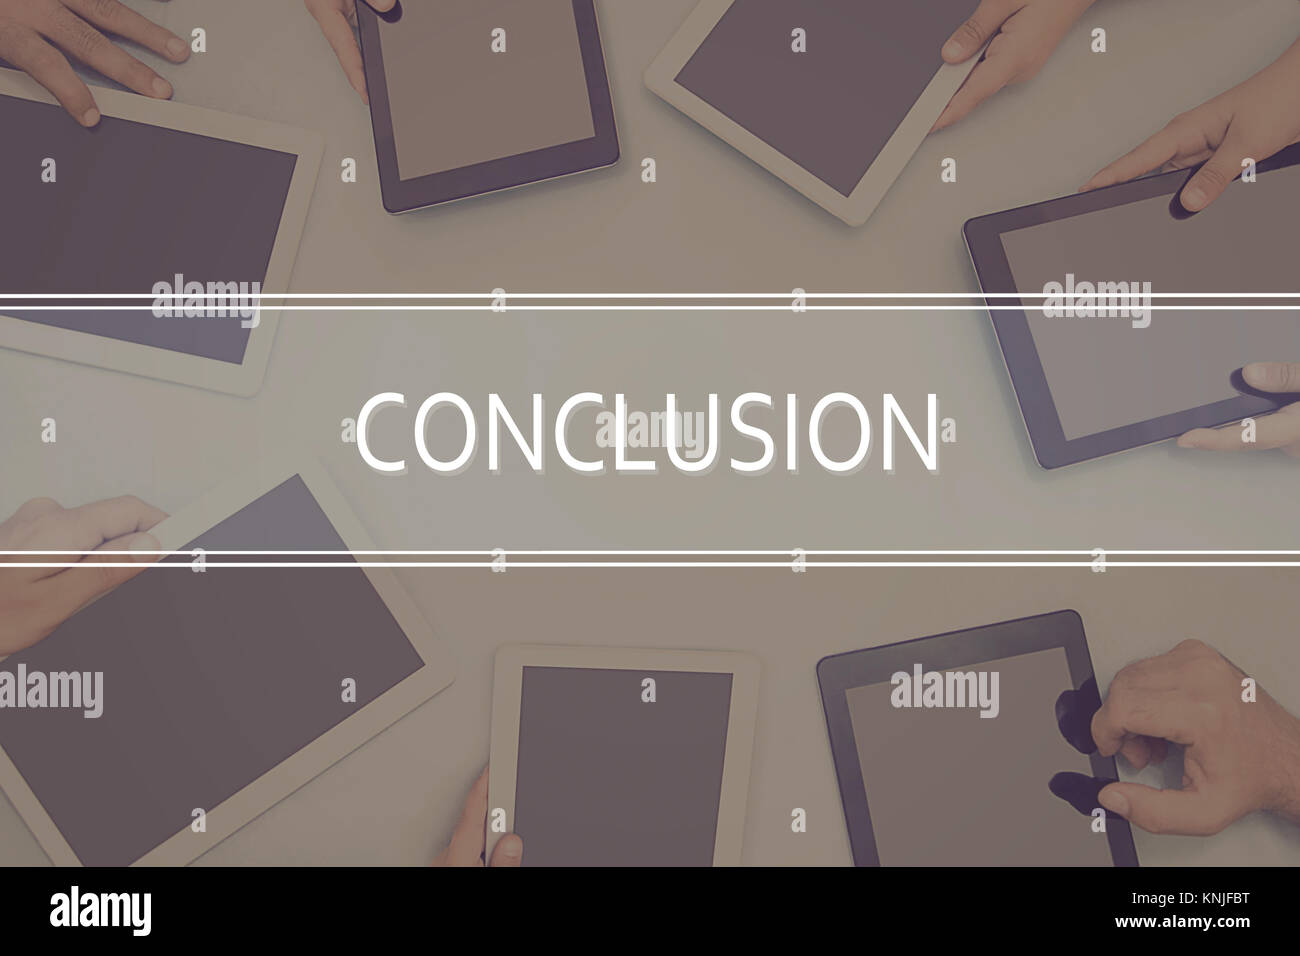 CONCLUSION CONCEPT Business Concept. - Stock Image